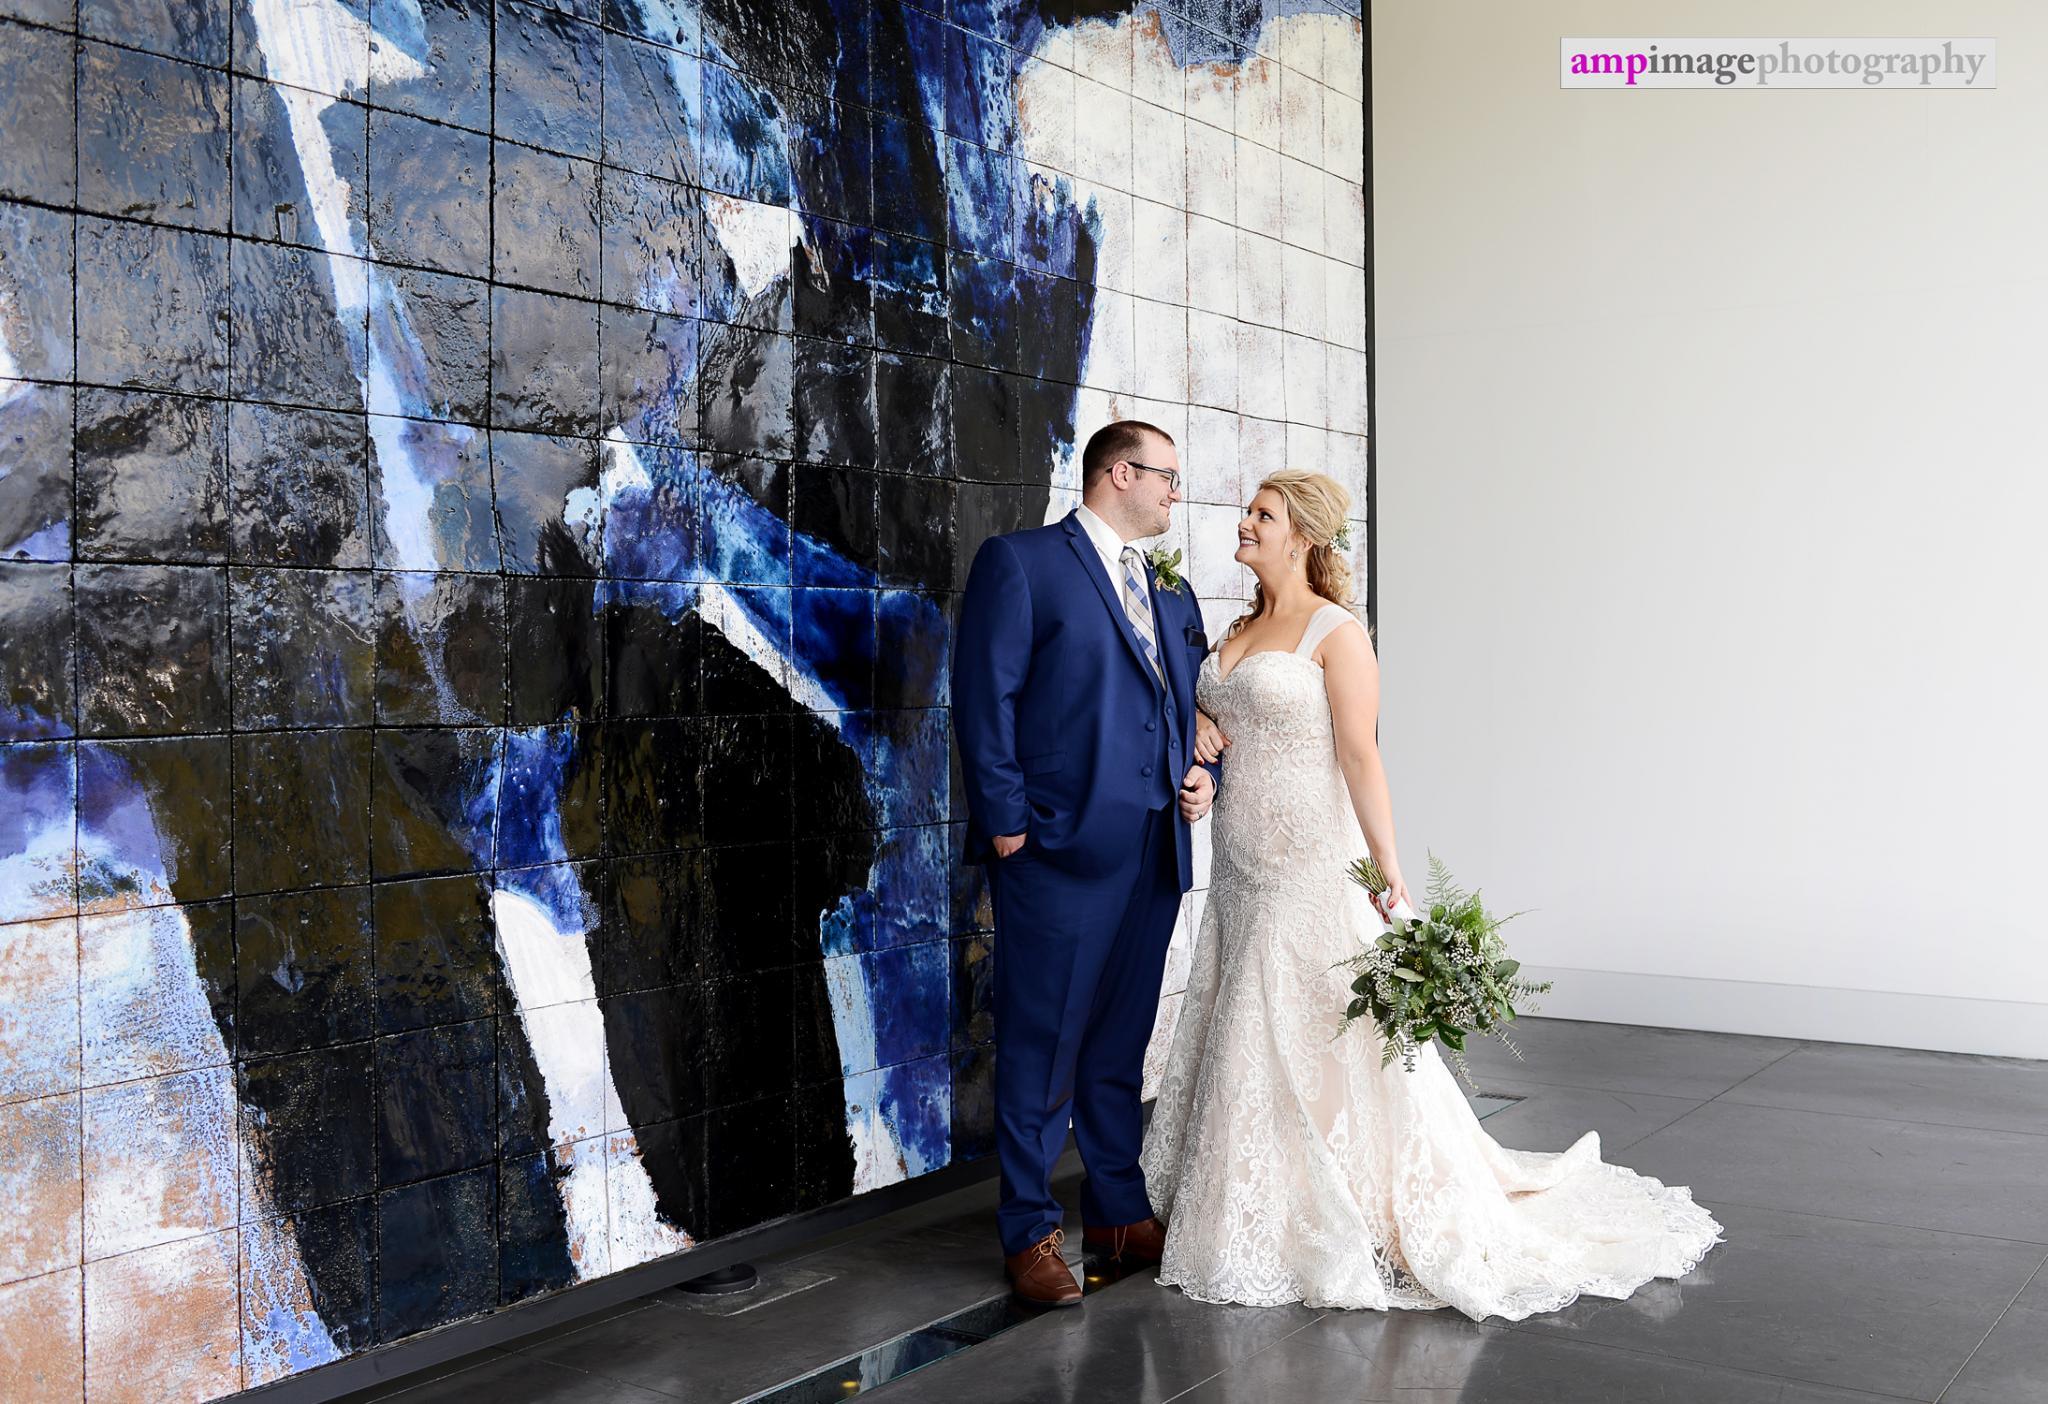 Jenna & Kevin | Wedding | The Butler Institute of Art Trumbull Branch | The Avalon Inn | Warren, OH | Youngstown Wedding Photographer